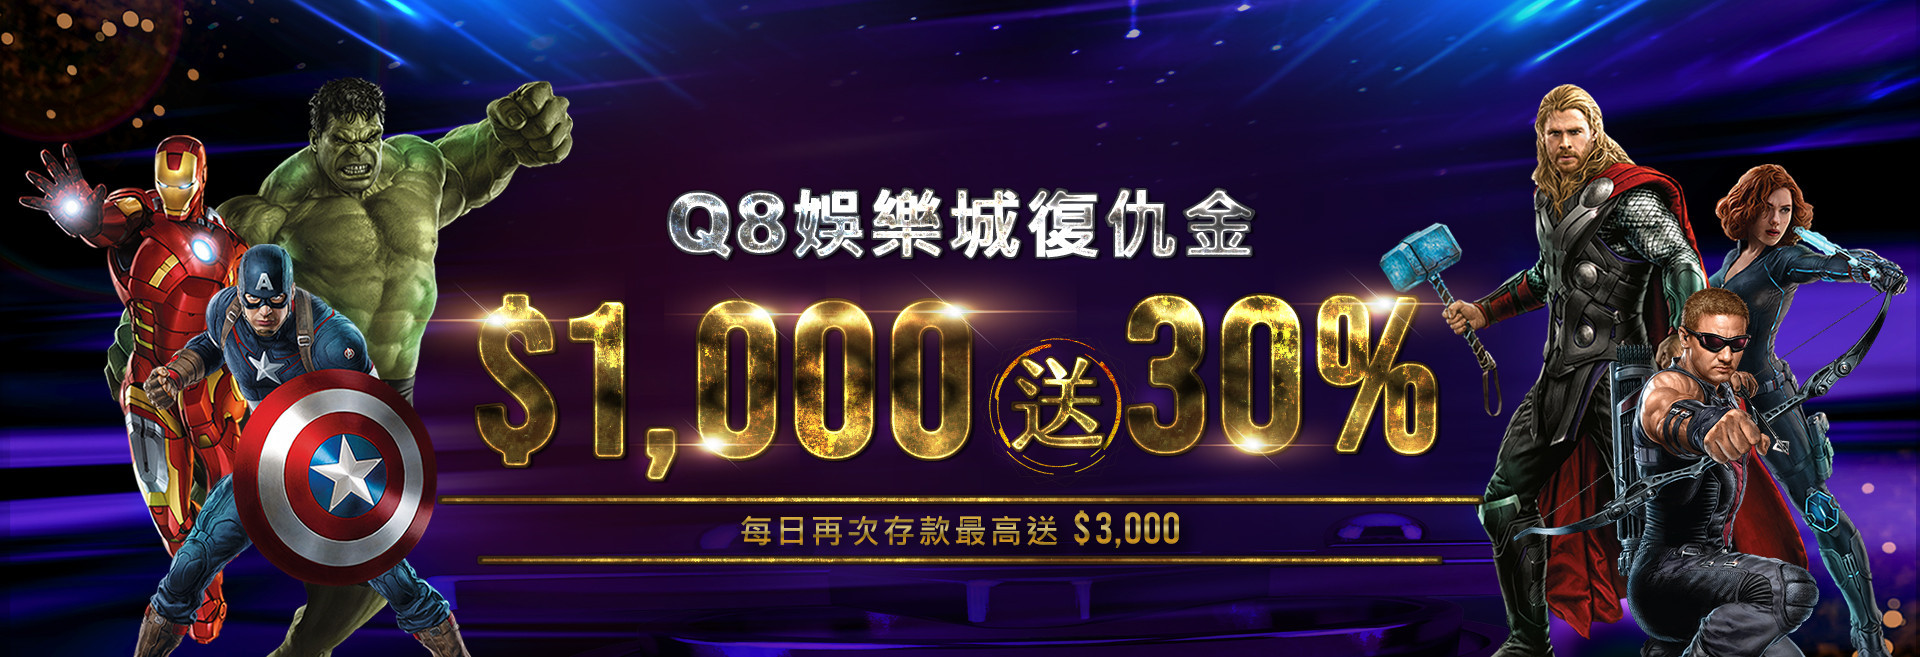 Q8娛樂城復仇金每日再次存款1,000送30%!